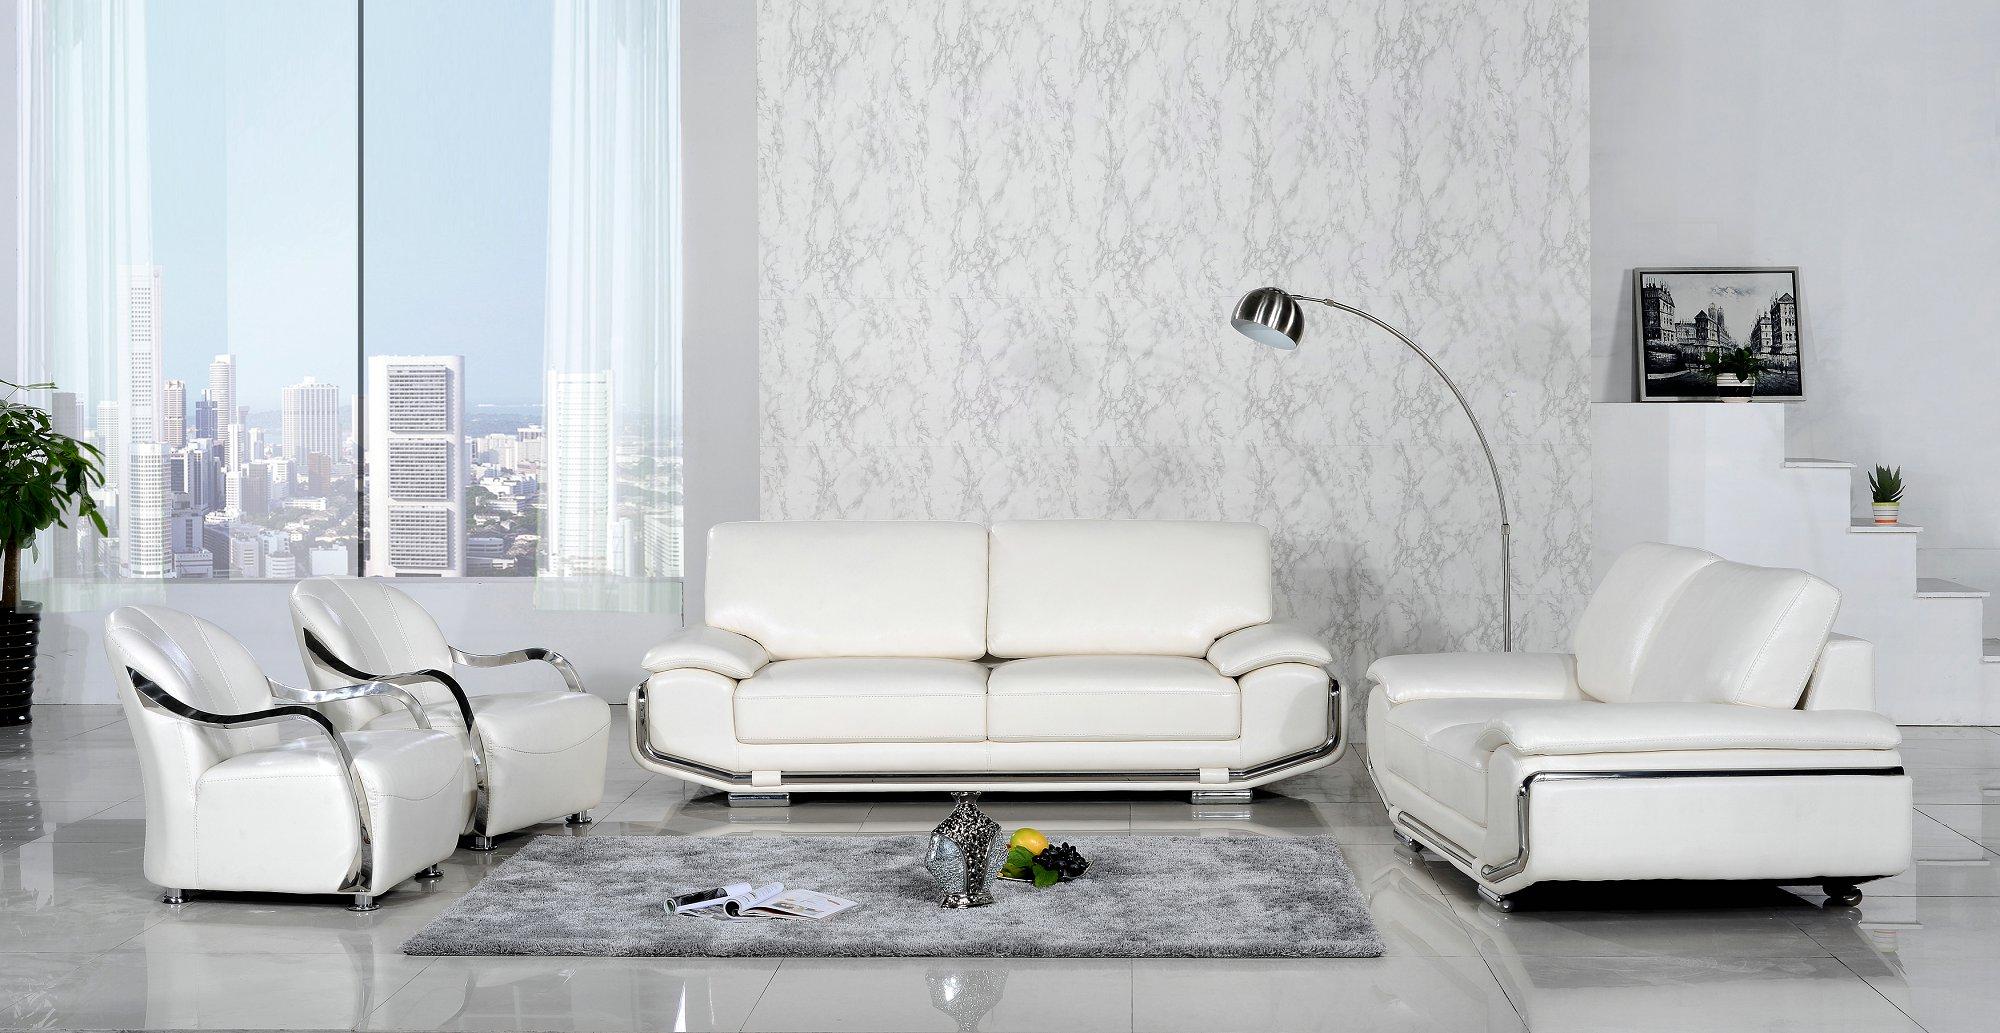 fice Sofa fice Chair L AL345 Sectional Sofa